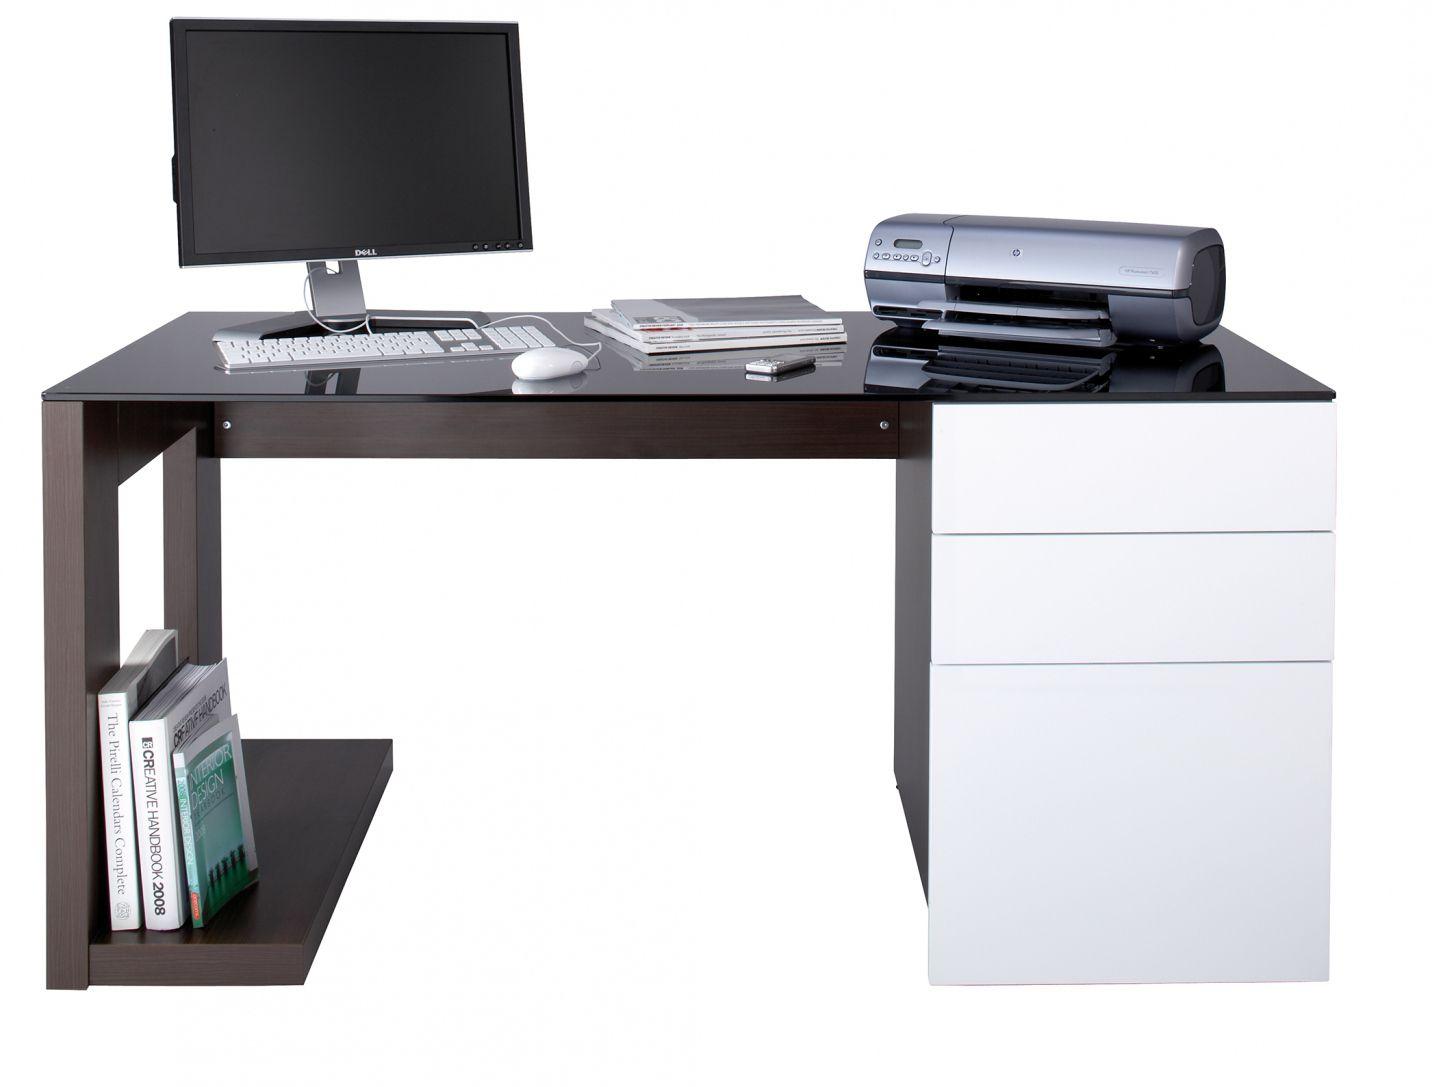 home office desk modern design. Computer Desk Modern Design - Home Office Furniture Check More At Http://michael-malarkey.com/computer-desk-modern-design/ E